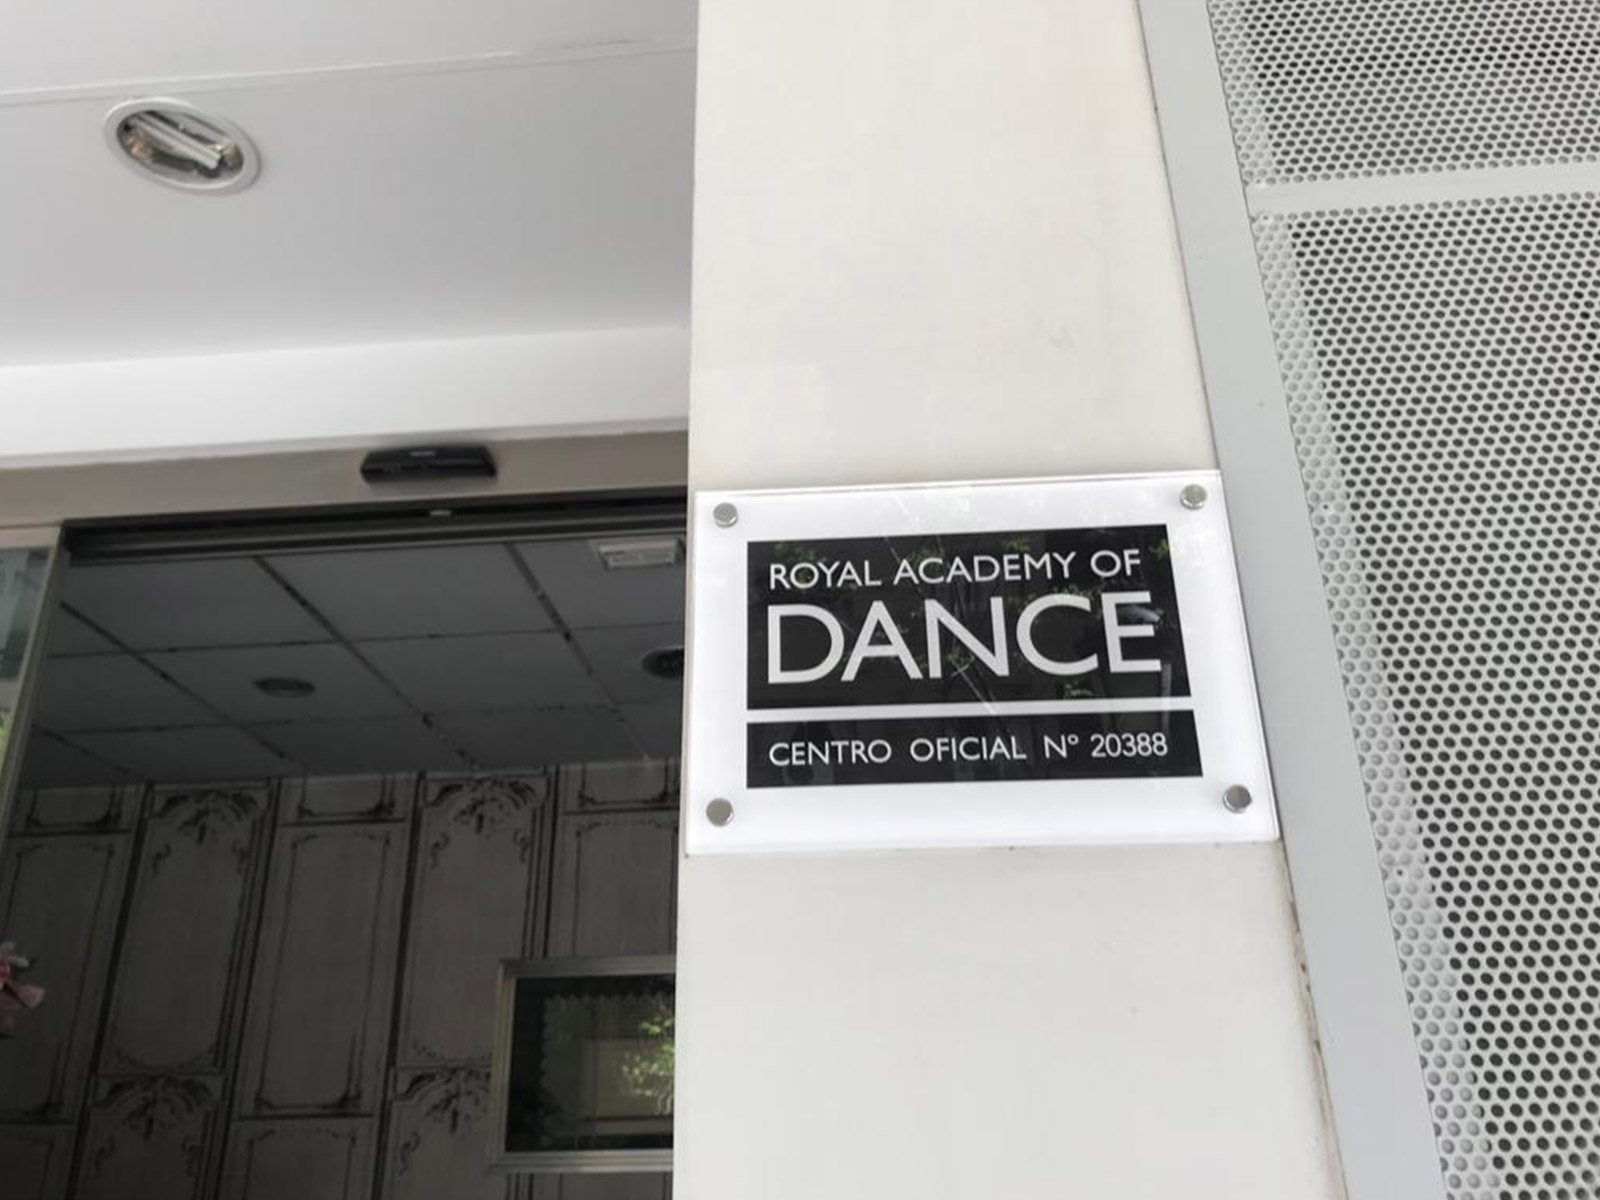 Esther Mortes - Escuela de Danza, Centro Oficial de la Royal Academy of Dance